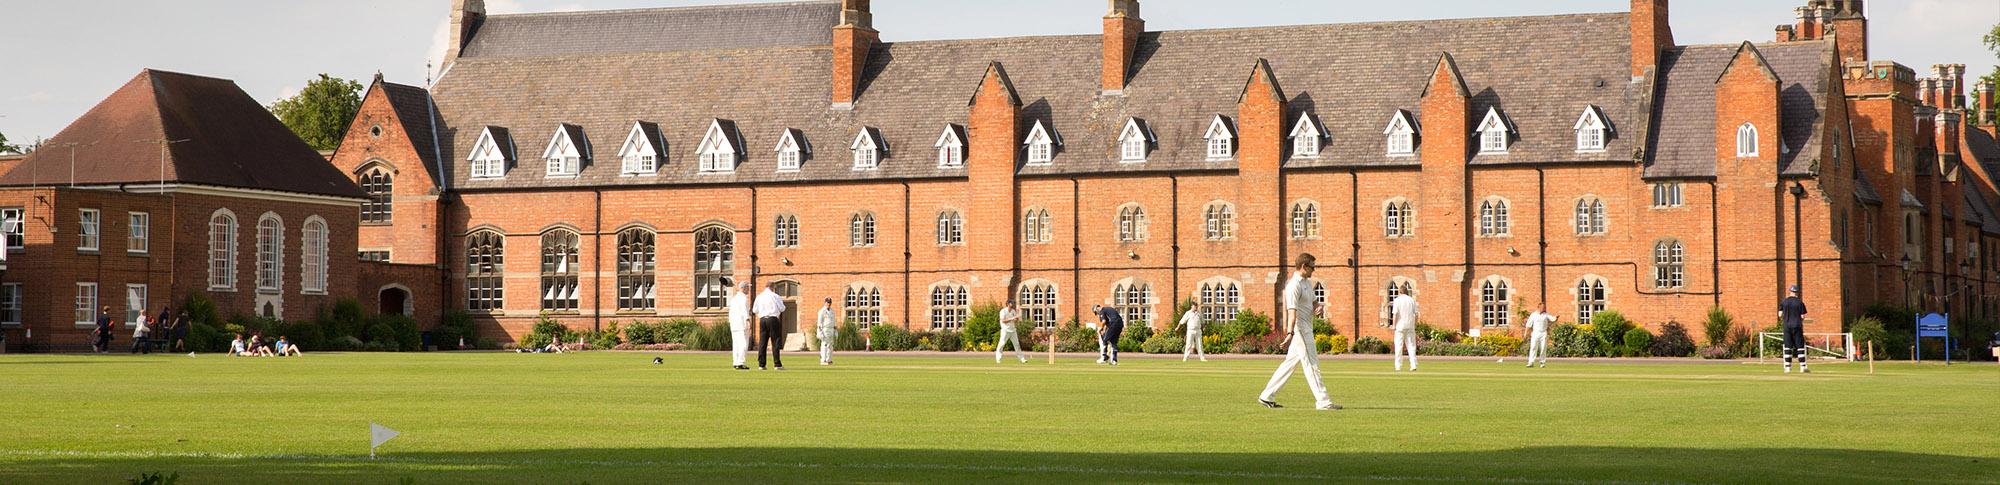 Ratcliffe College building